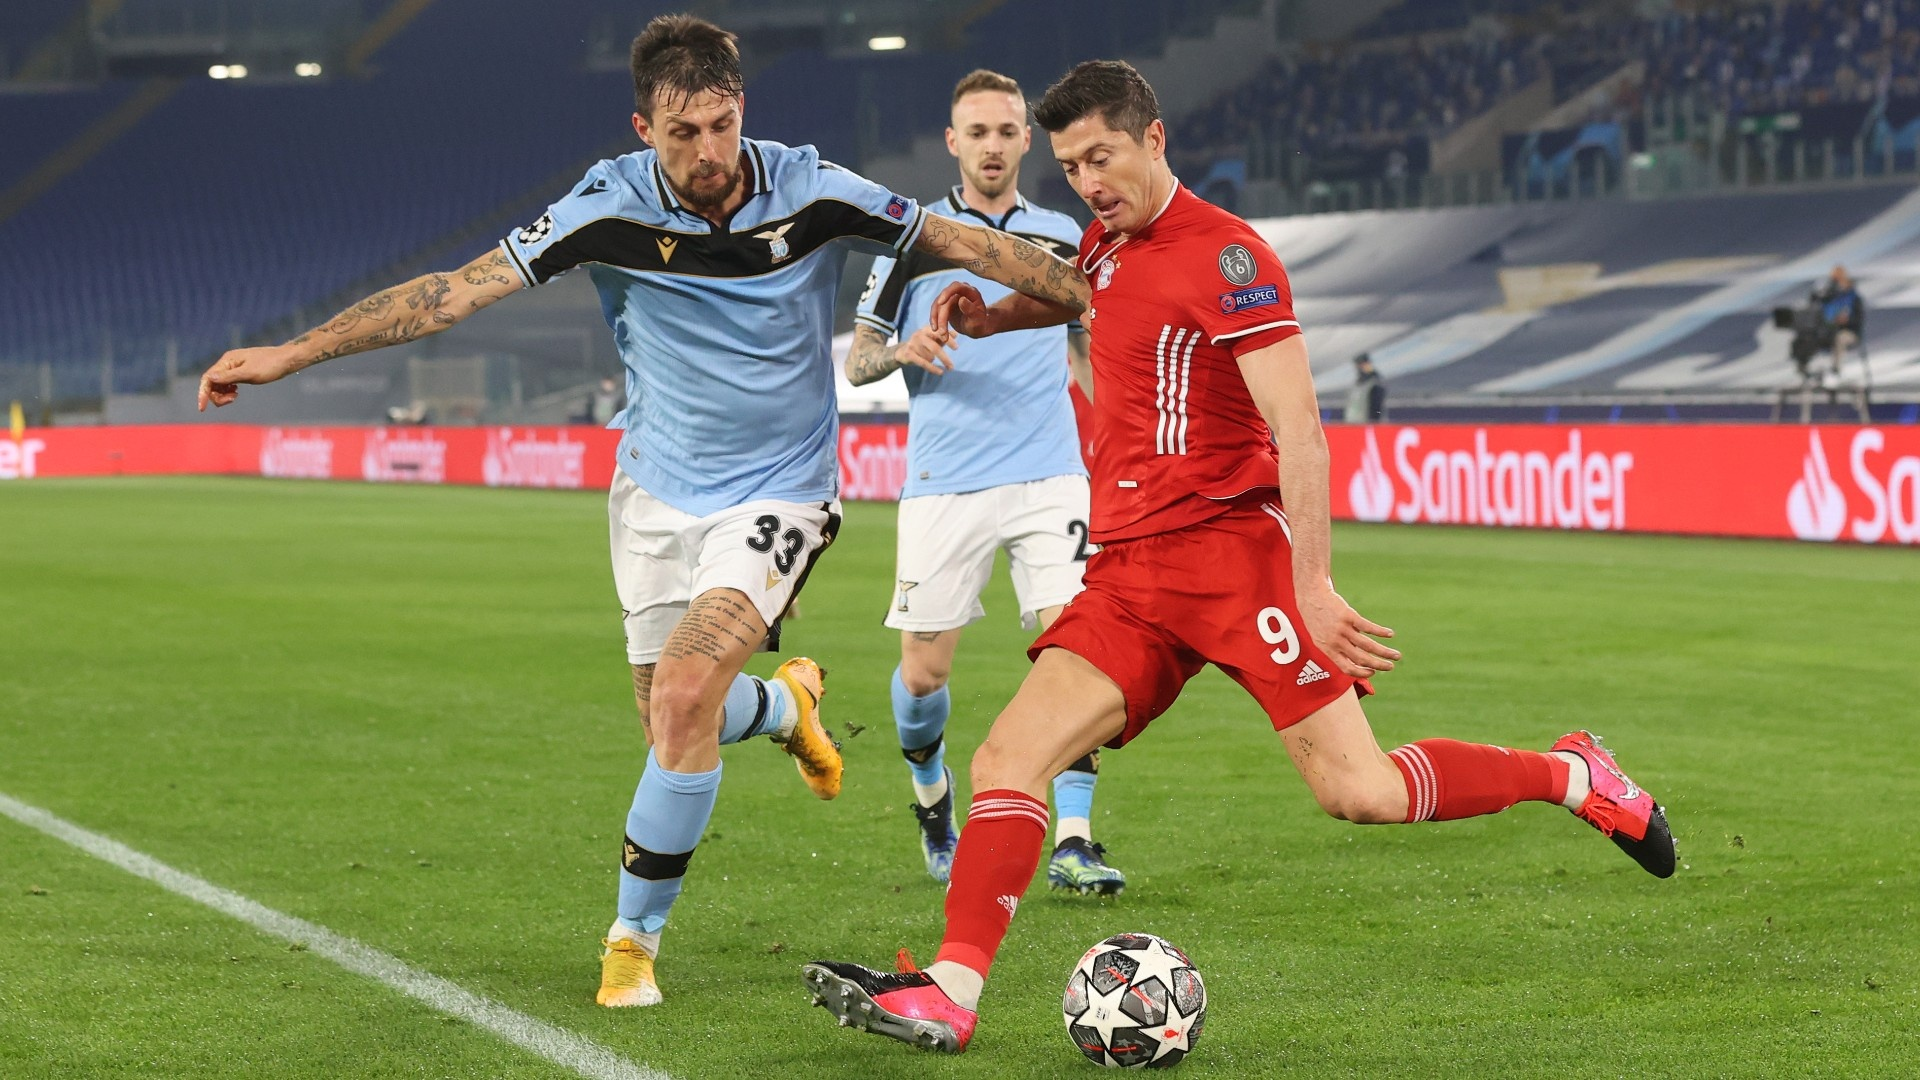 Watch Lazio vs. Bayern Munich Live Stream | DAZN CA